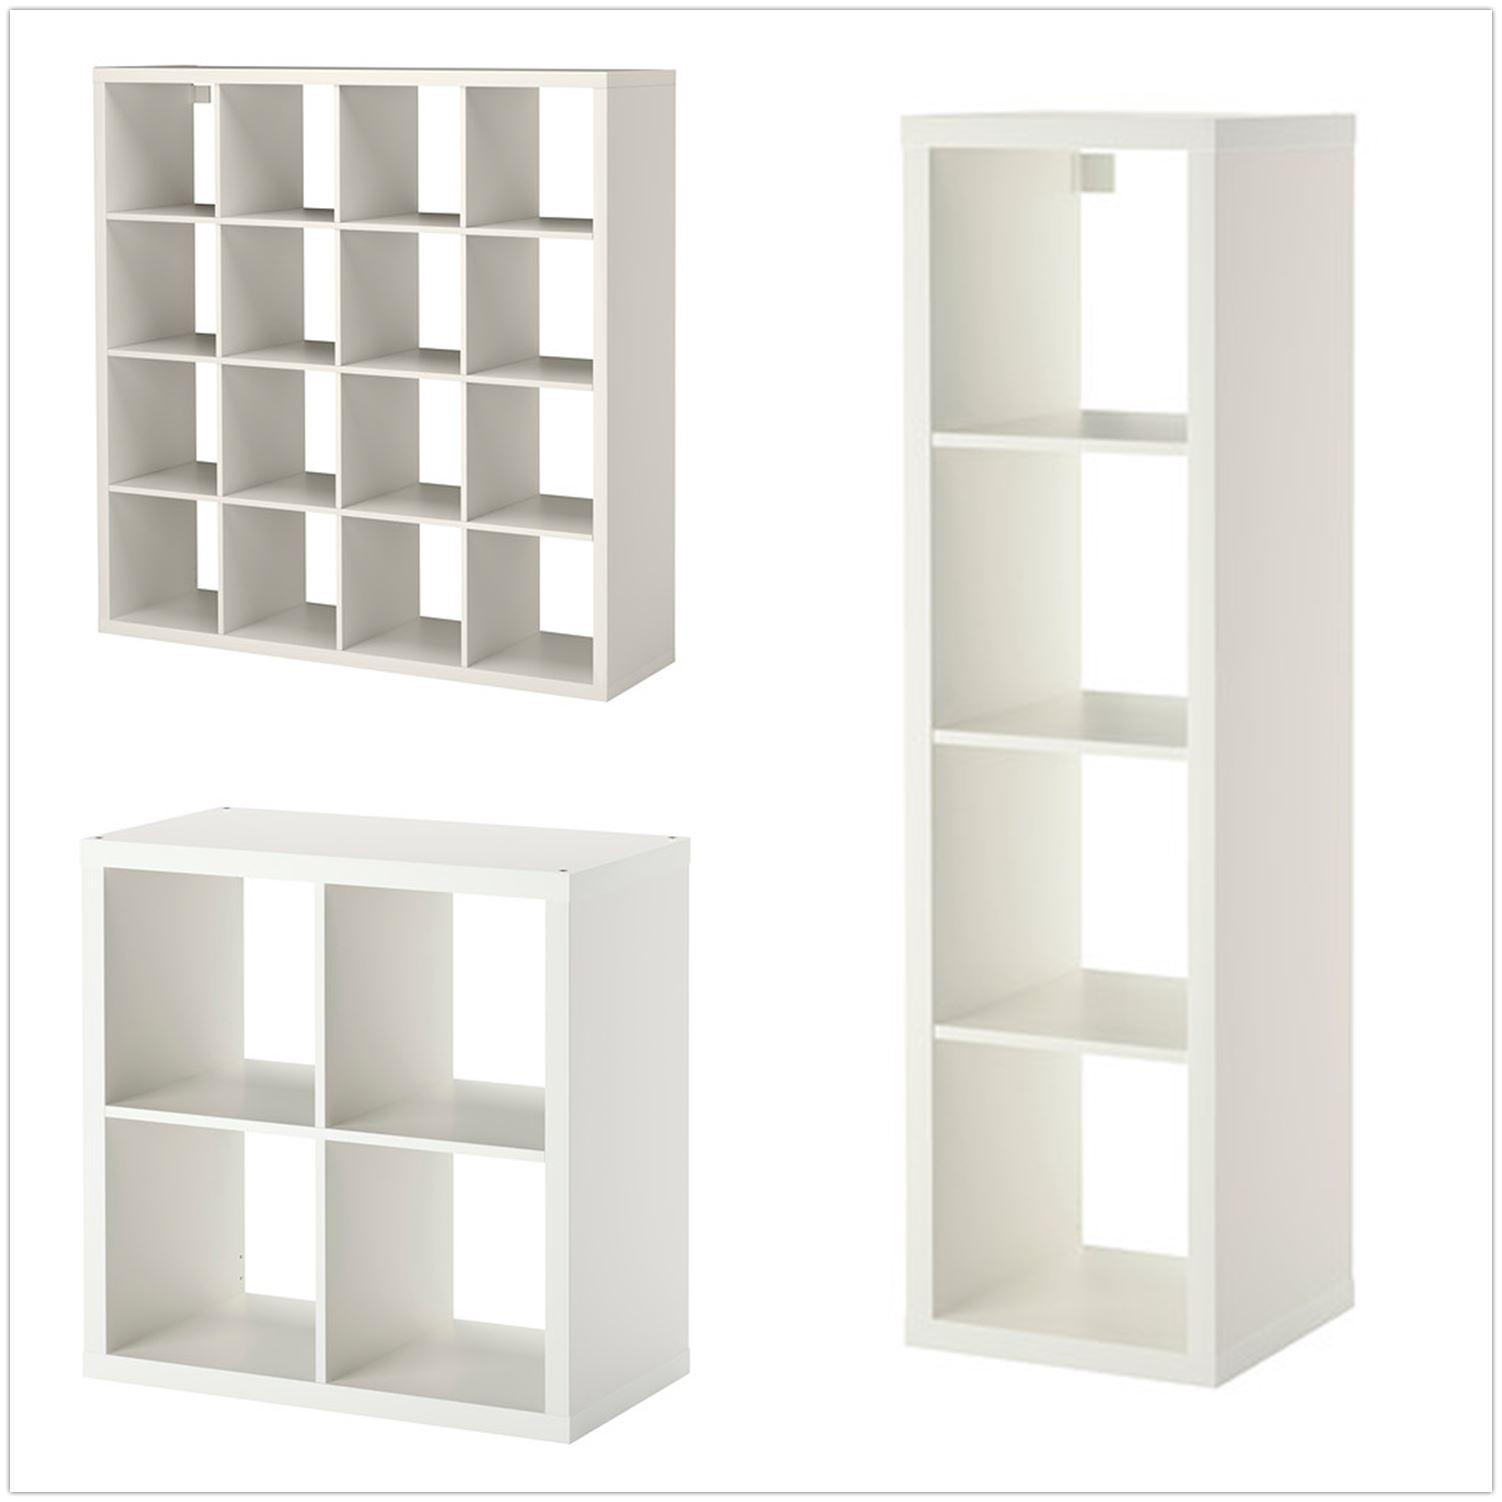 Ikea Kallax Cube Storage Series Shelf Shelving Units Bookcase For Storage Shelving Units (#9 of 15)